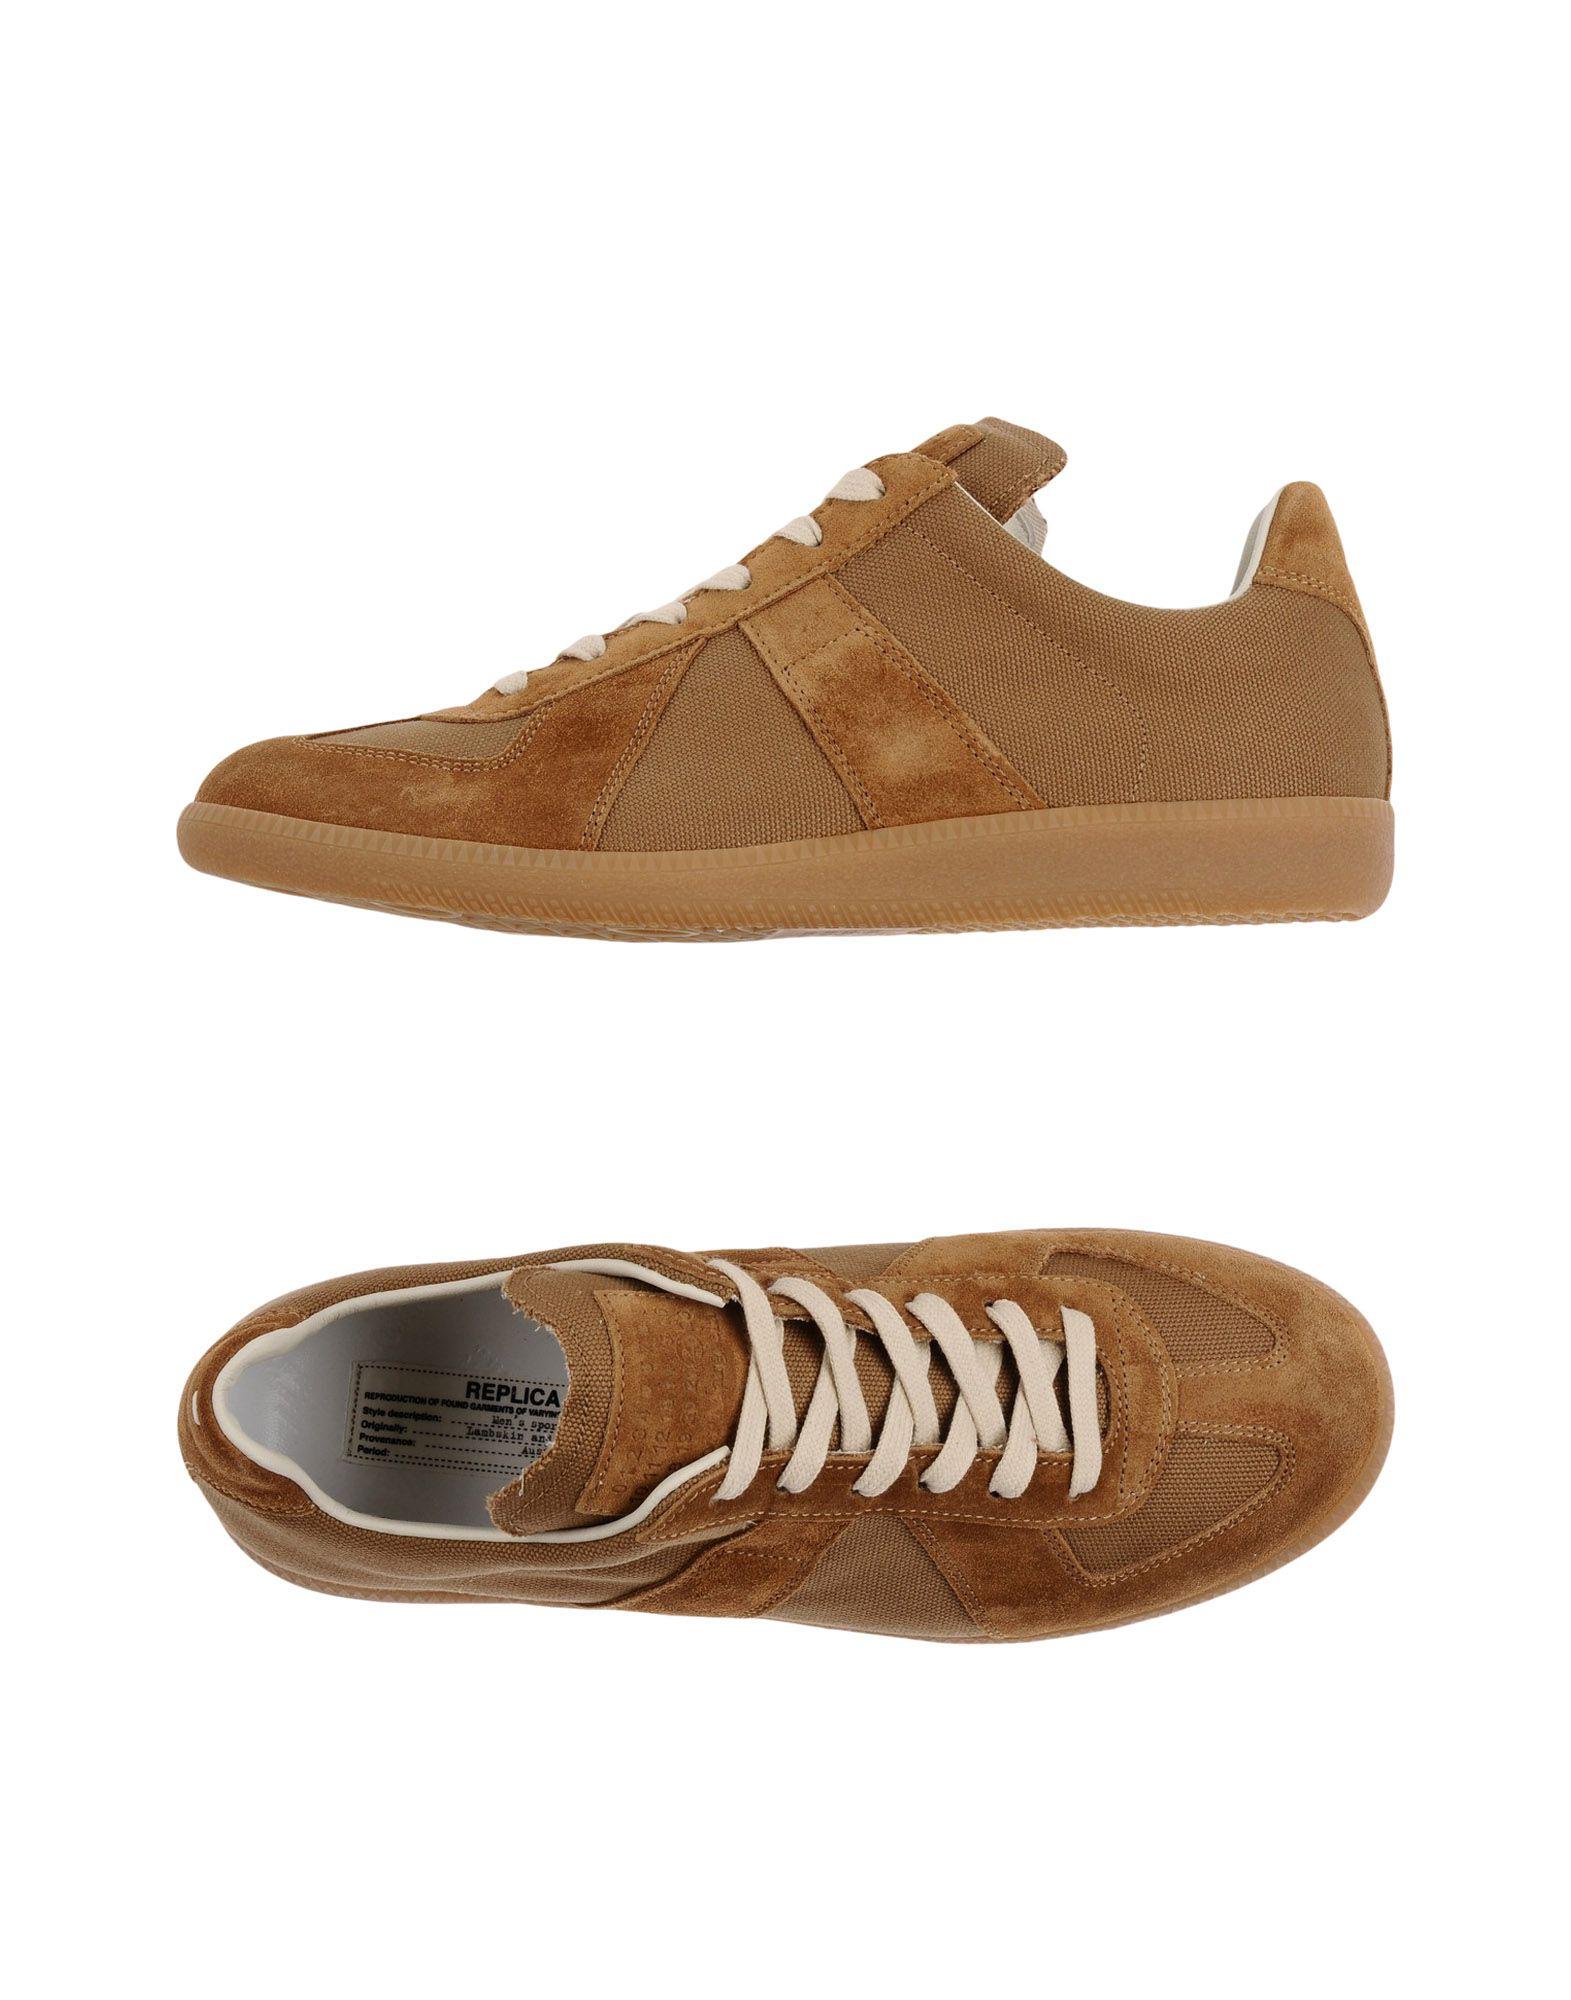 Maison Margiela Sneakers Herren  11343477XU Gute Qualität beliebte Schuhe